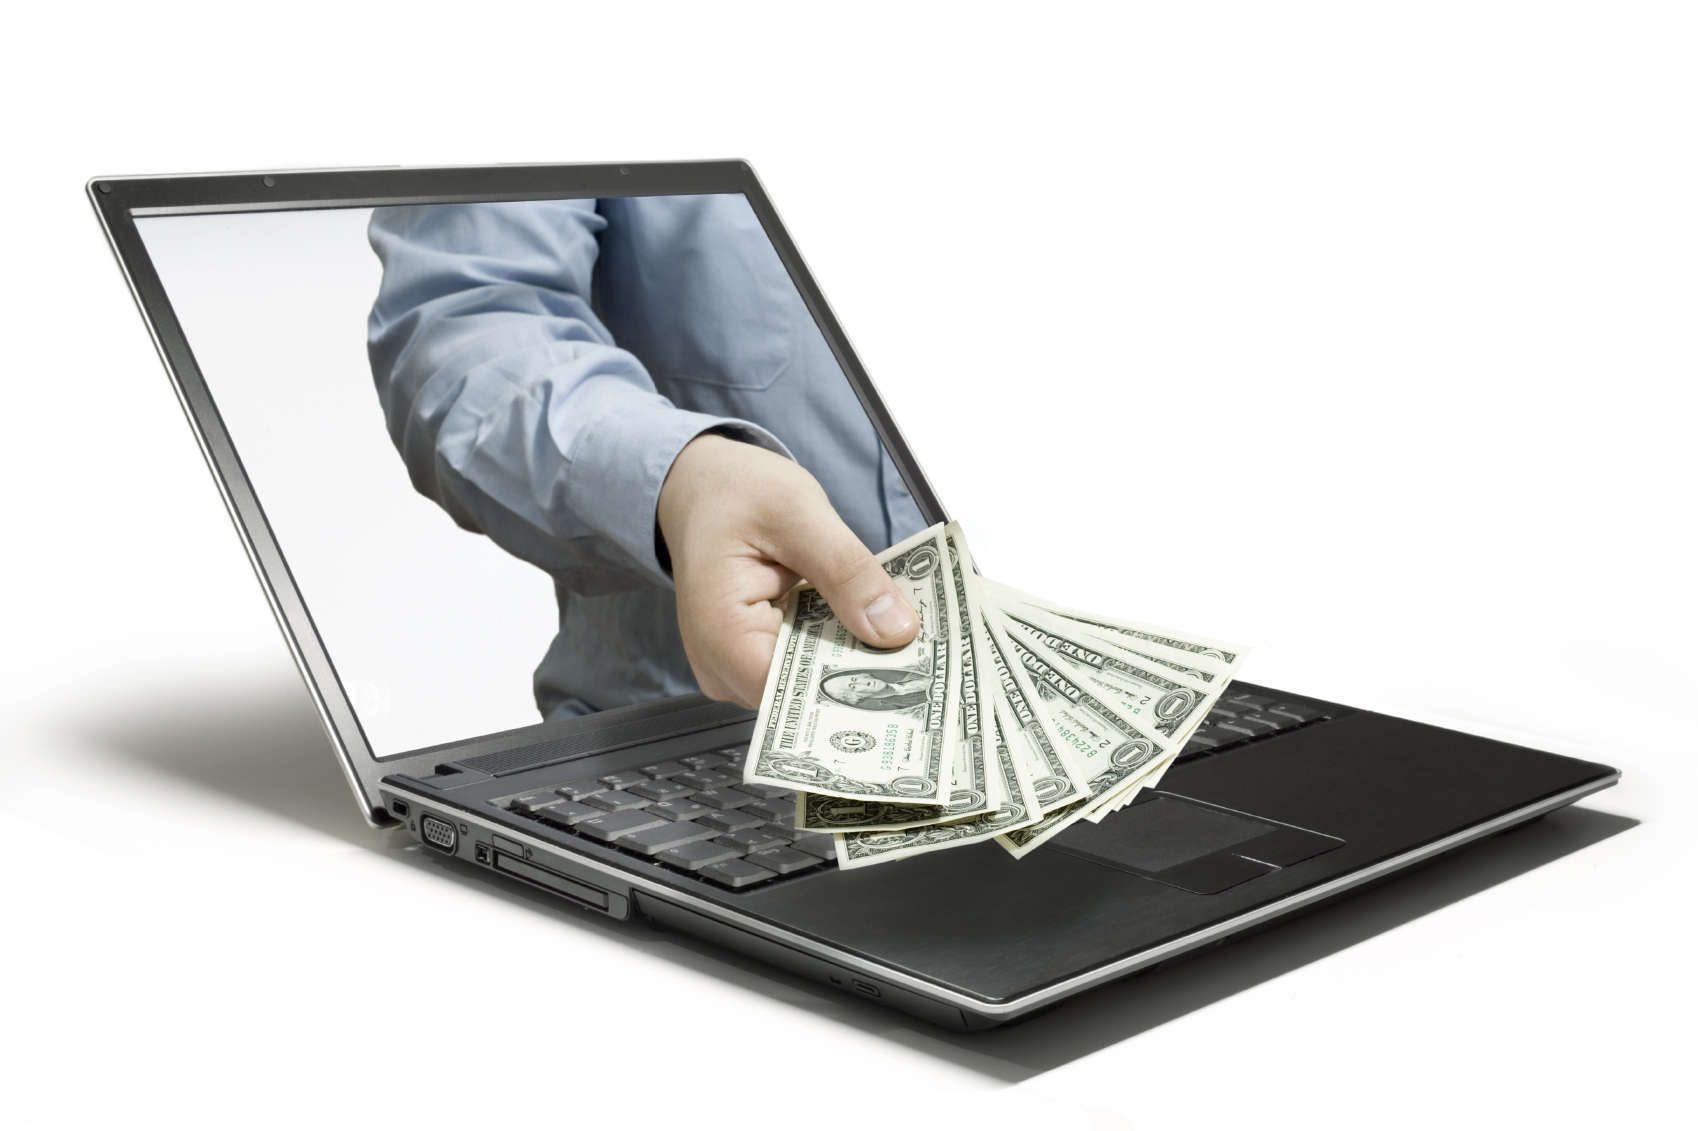 Работа в интернете продажа картинок